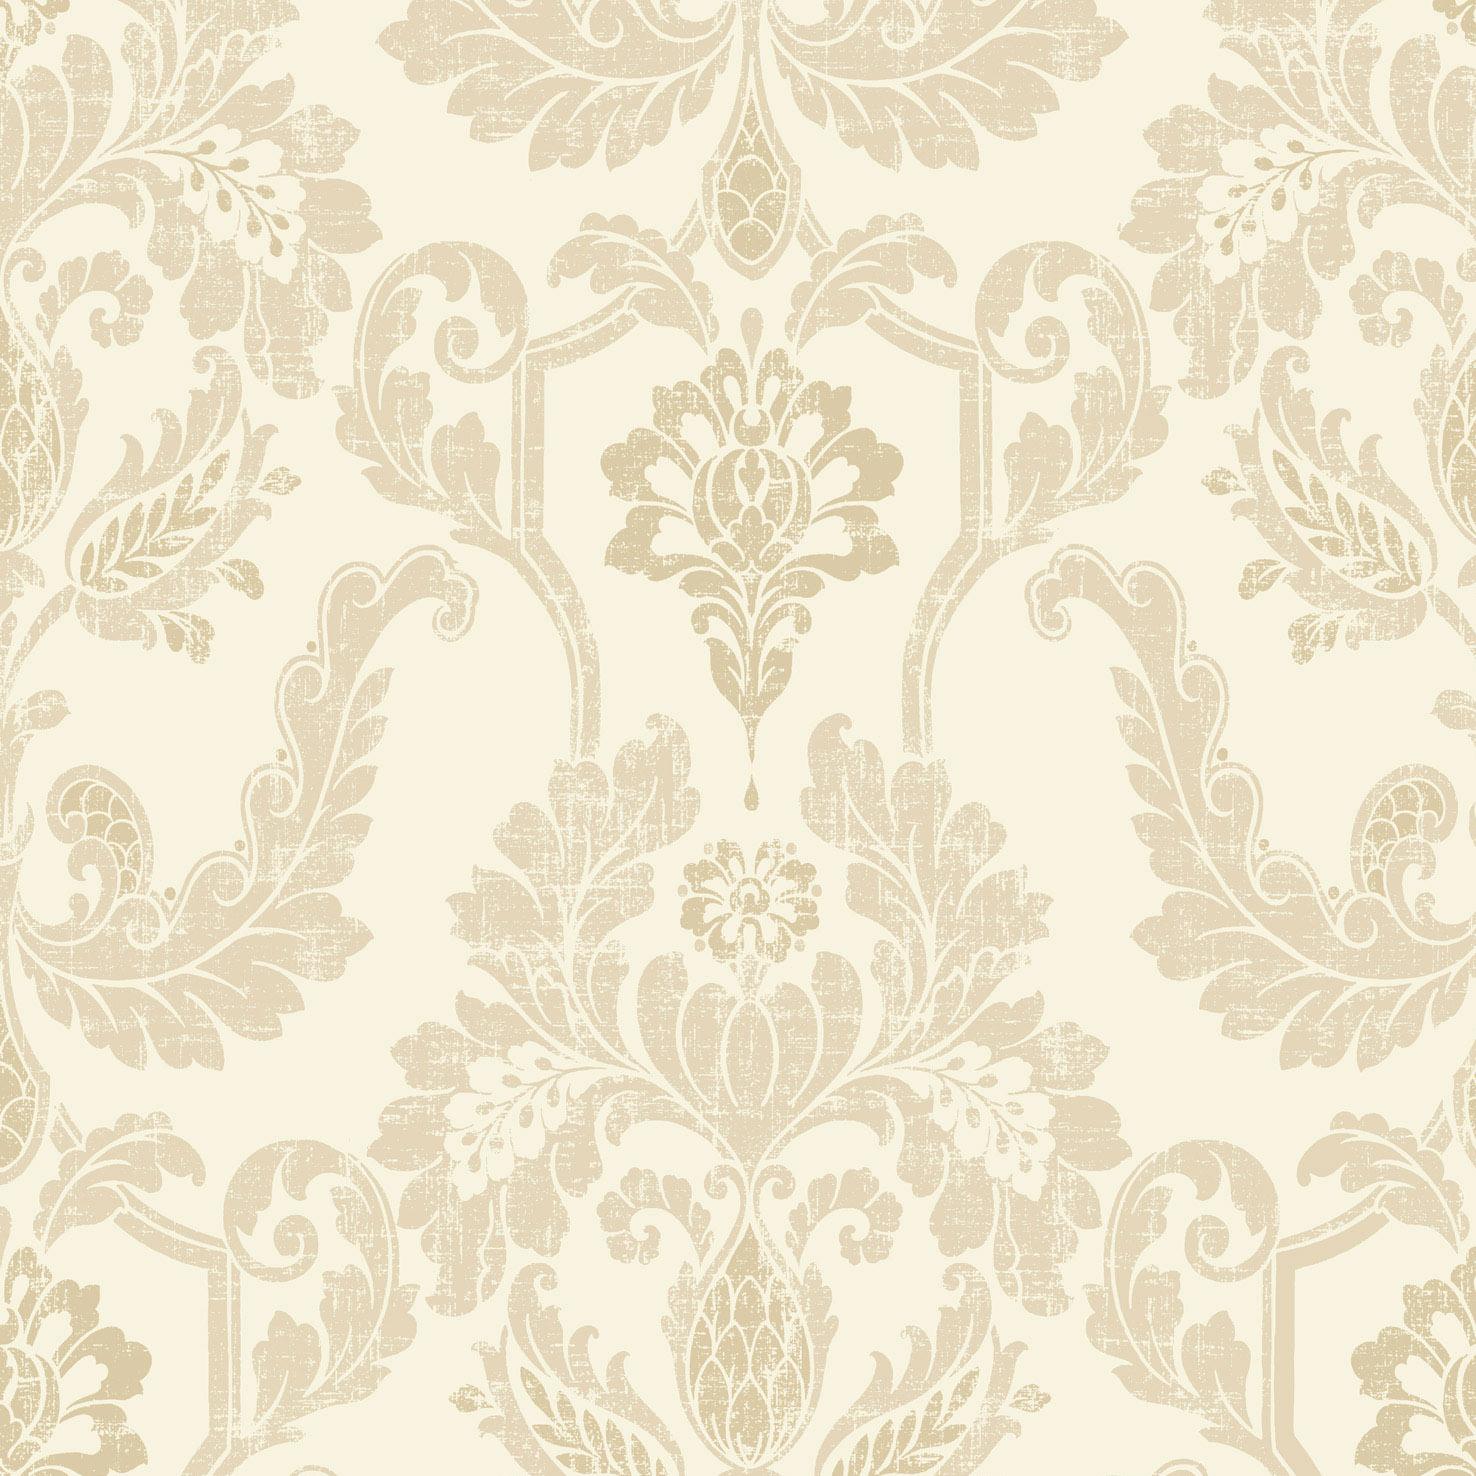 Elegant Cream Hallway With Damask Wallpaper: Gold And Cream Wallpaper